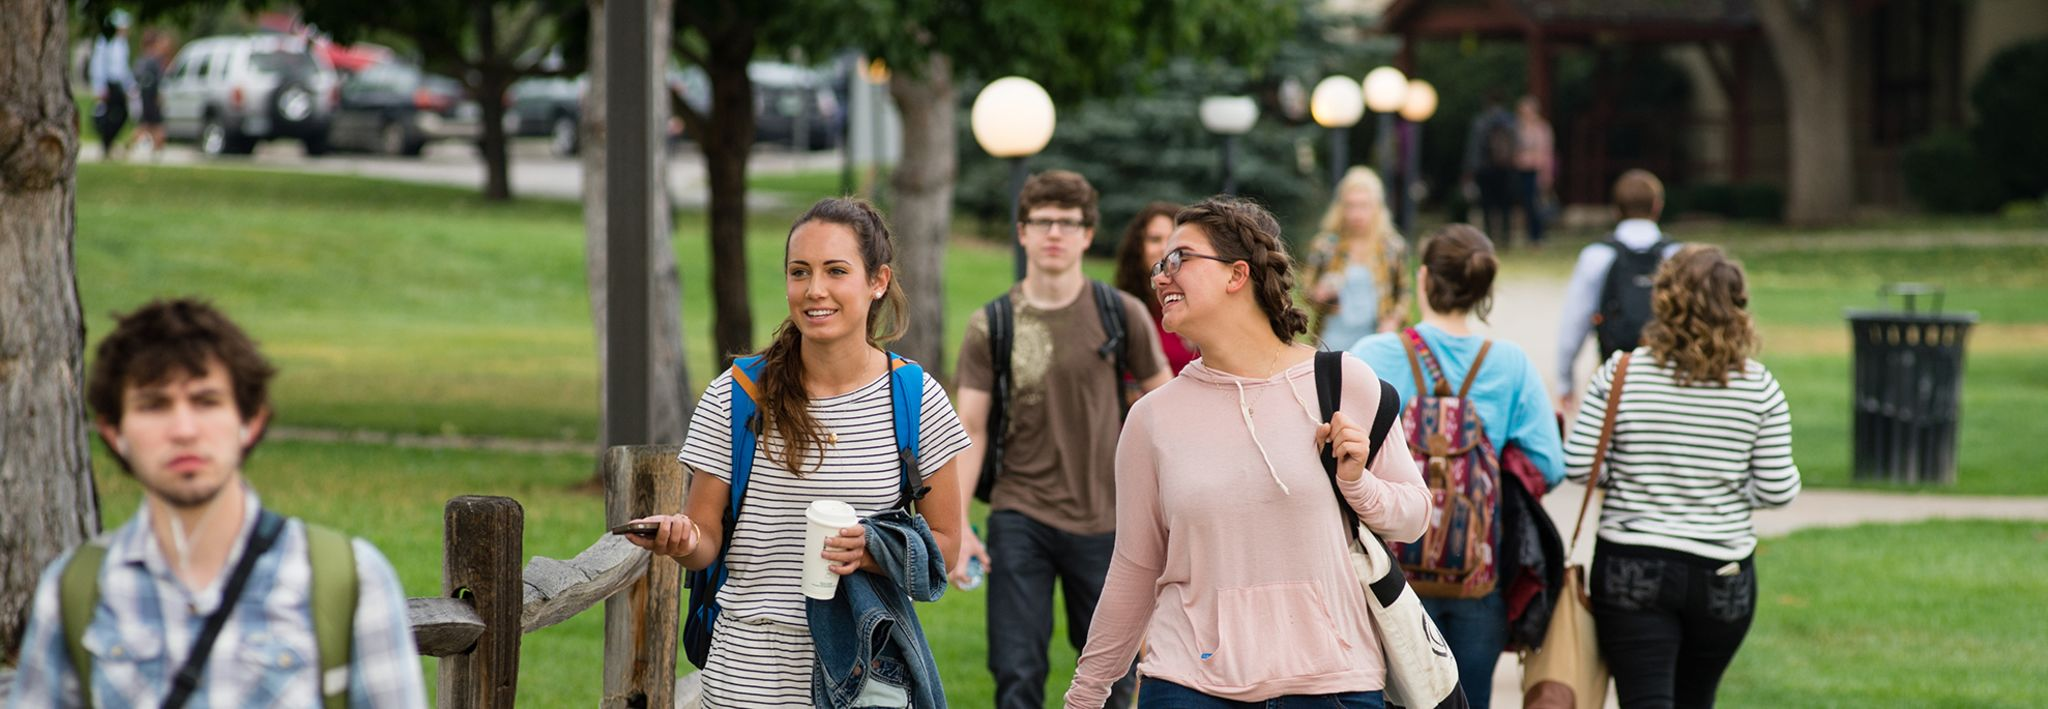 CCU students walking on a path through campus.